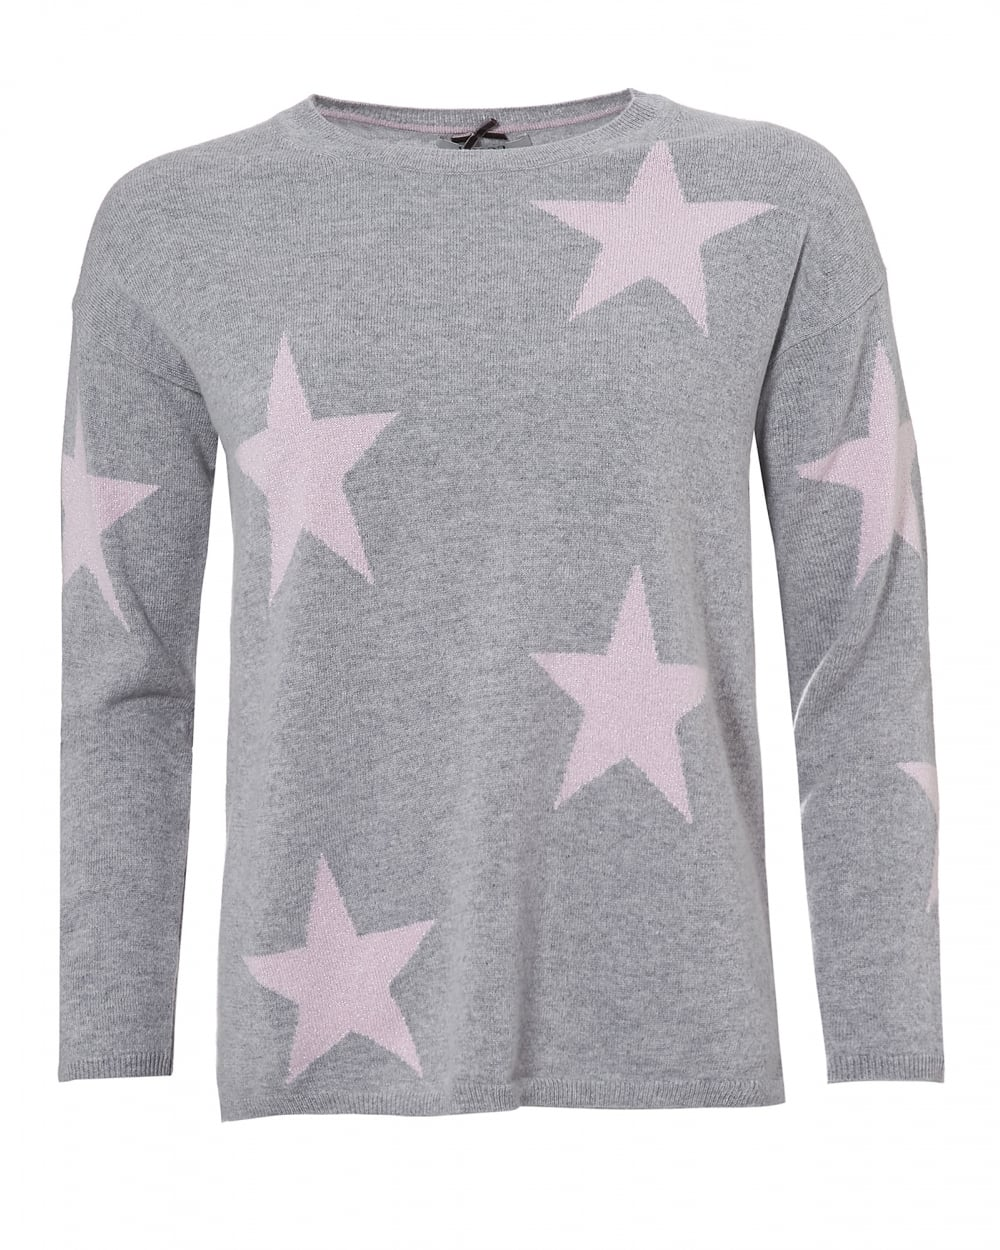 Womens Grey Sophie Jumper, Pink Star Print Sweater